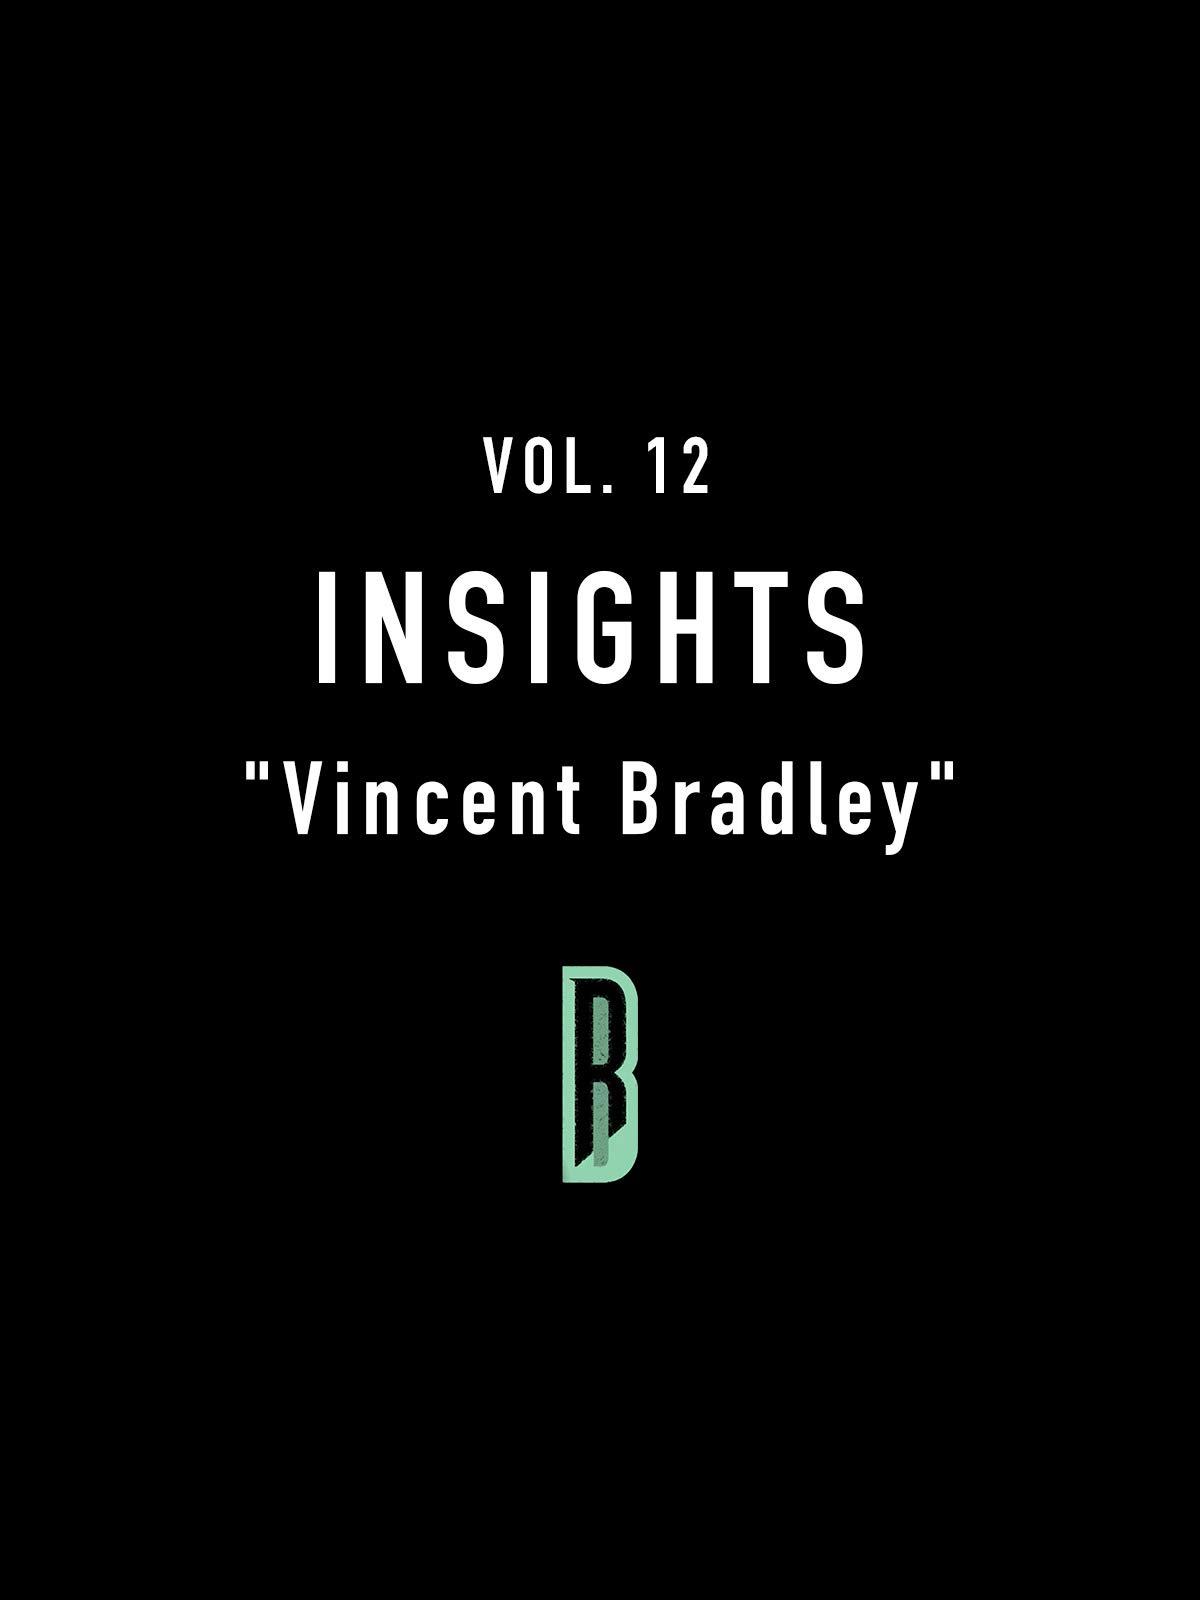 Insights Vol. 12